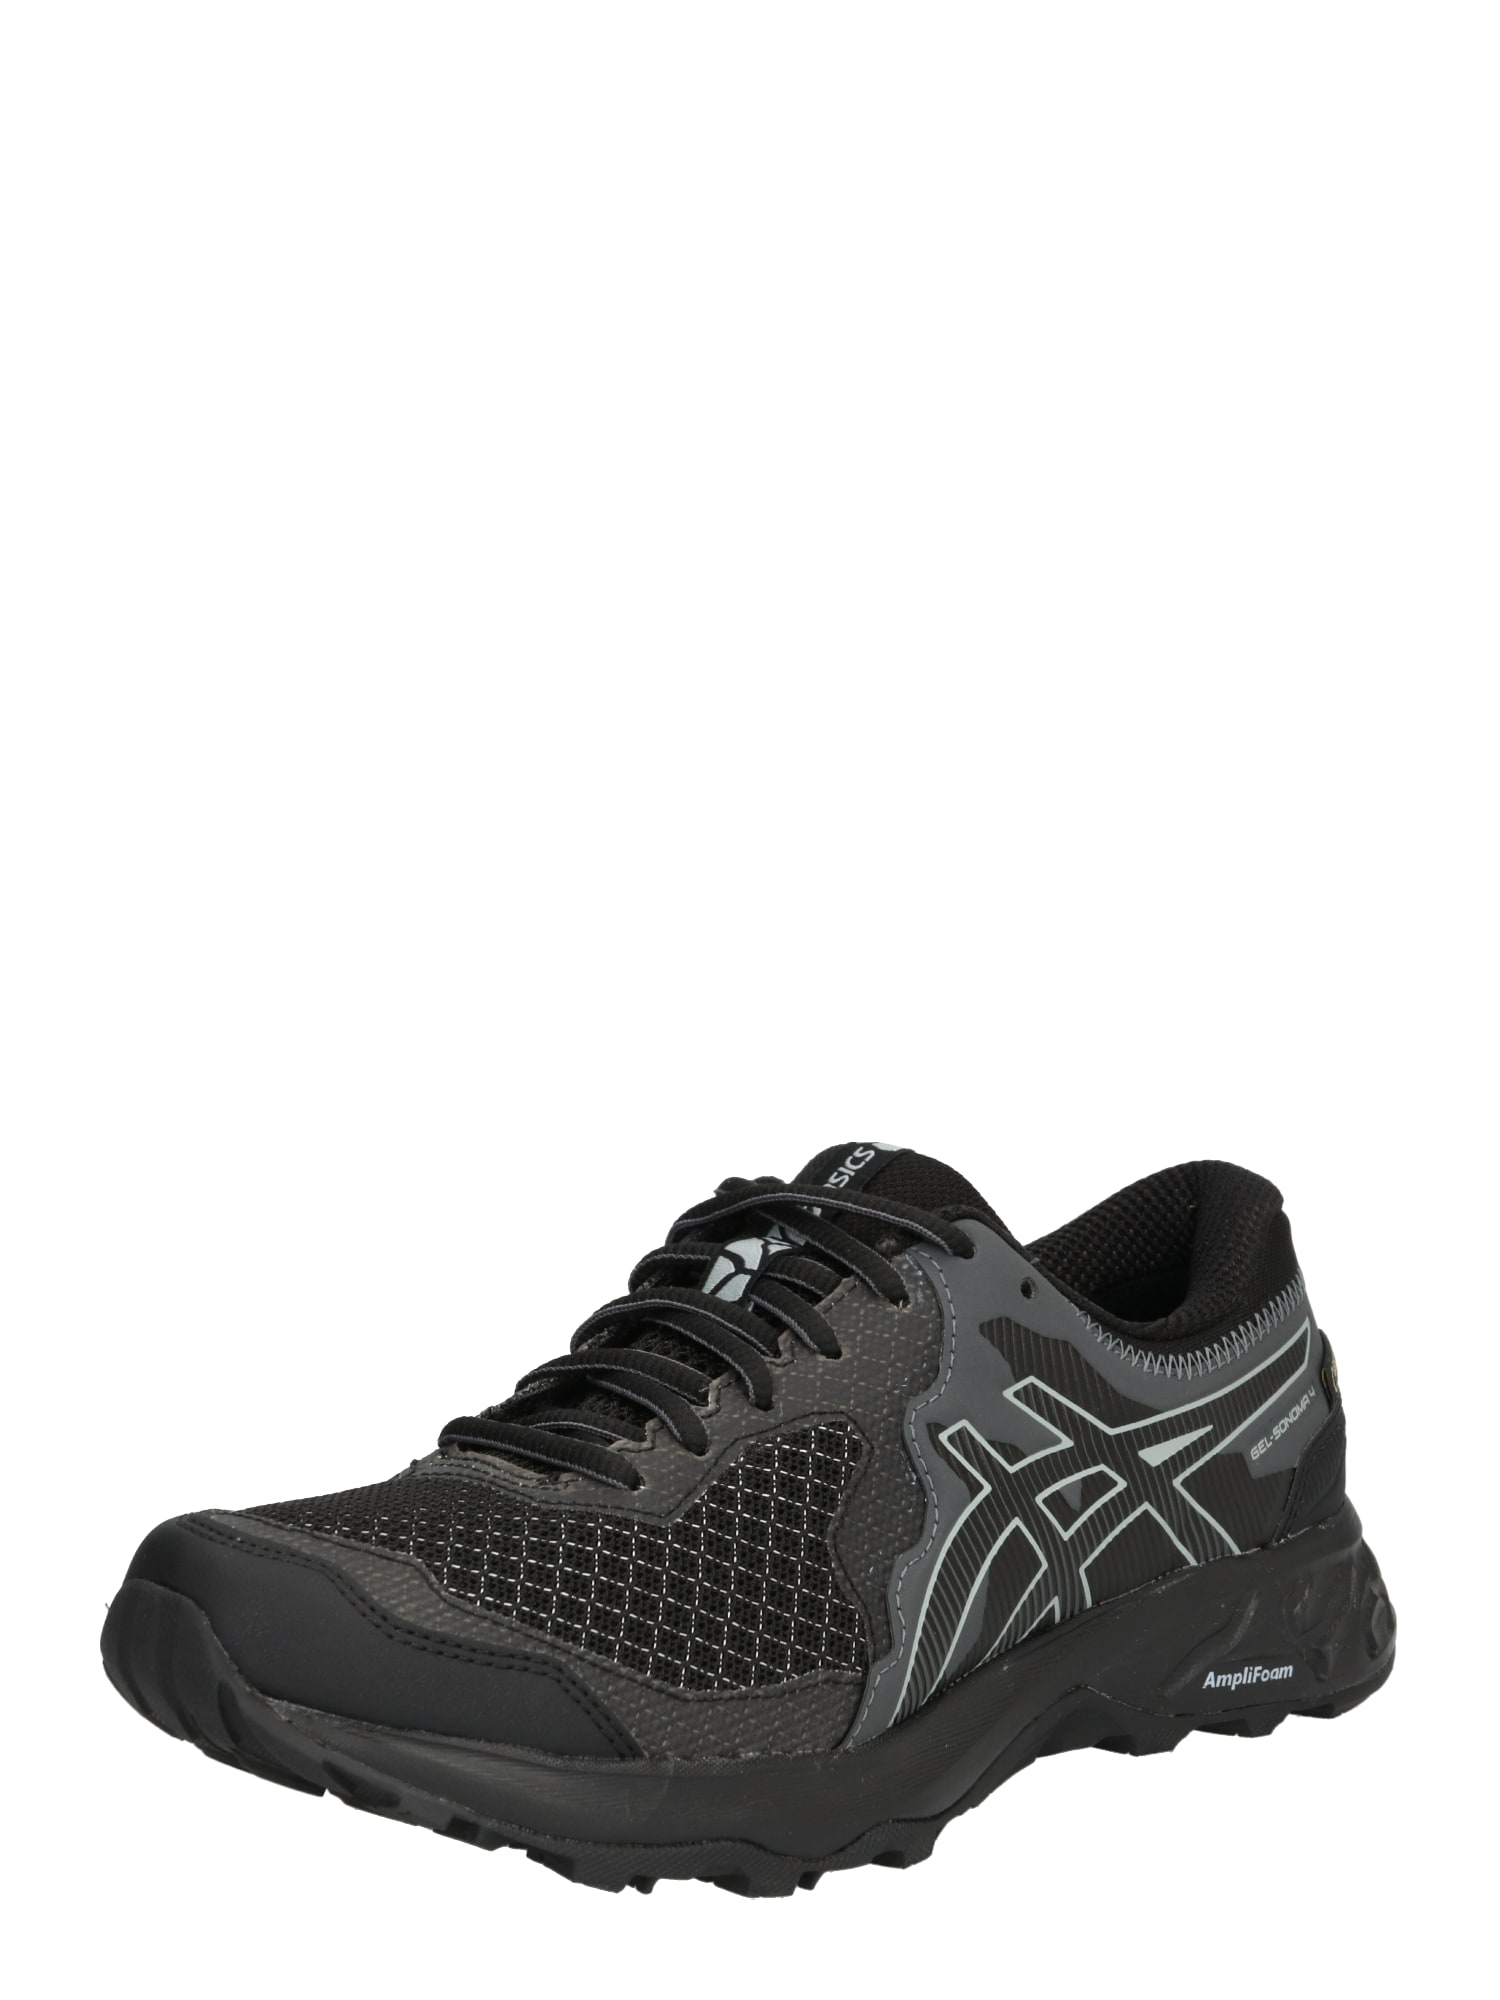 Běžecká obuv GEL-SONOMA 4 GTX tmavě šedá černá ASICS